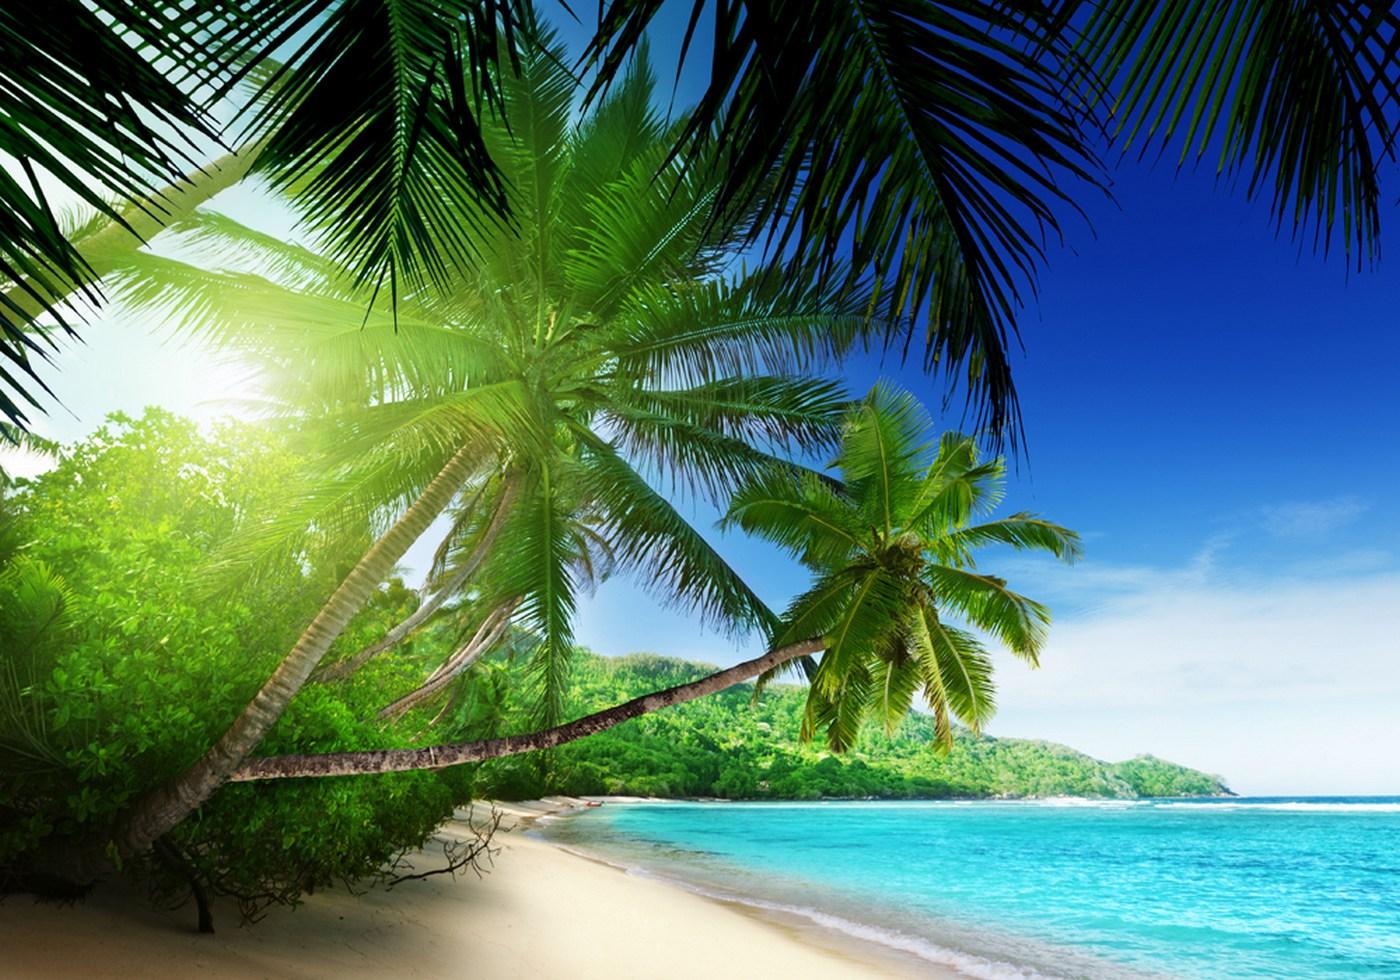 Vlies Fototapete 5   Paradise Beach Strand Tapete Strand Meer Palmen Beach  3D Ozean Palme Blau